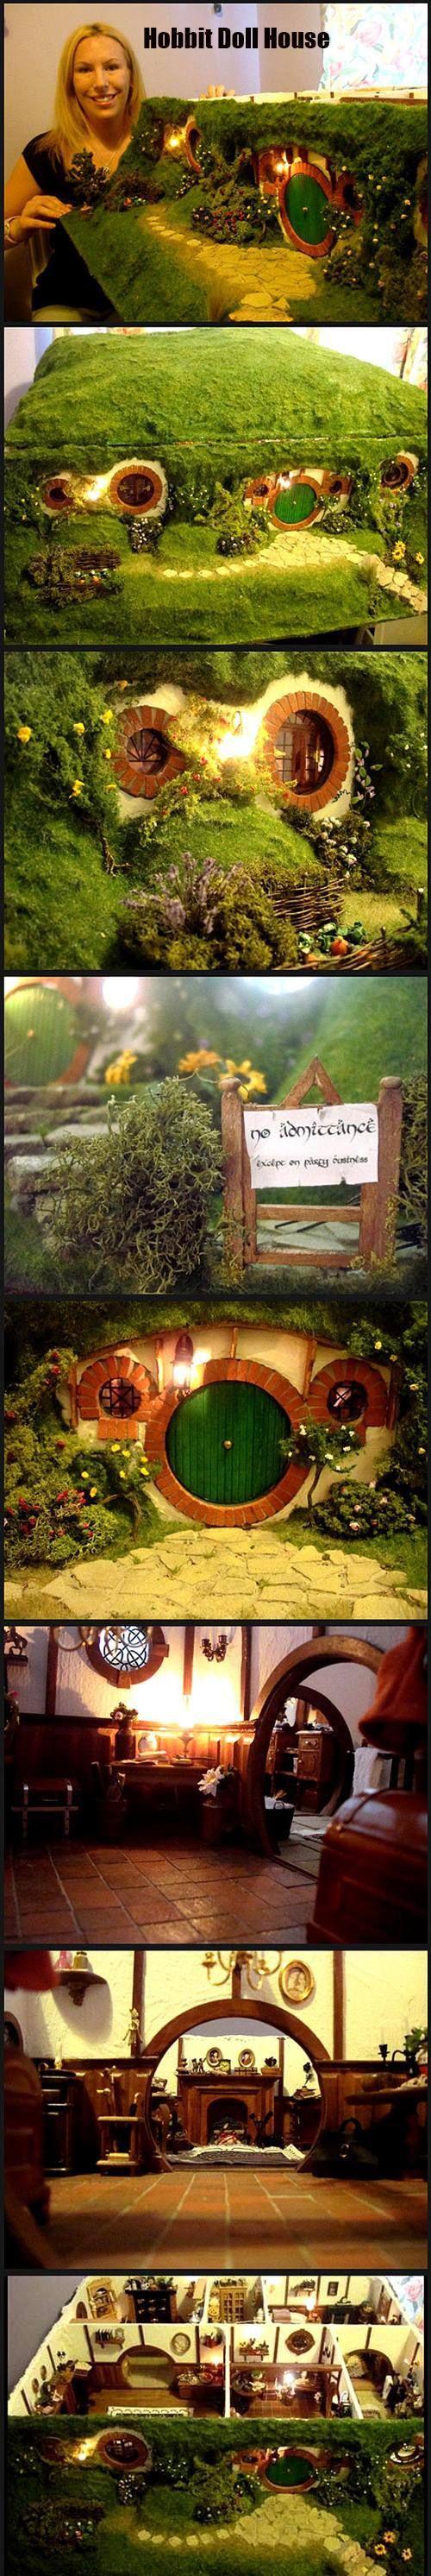 Hobbit dollhouse. Brilliant!